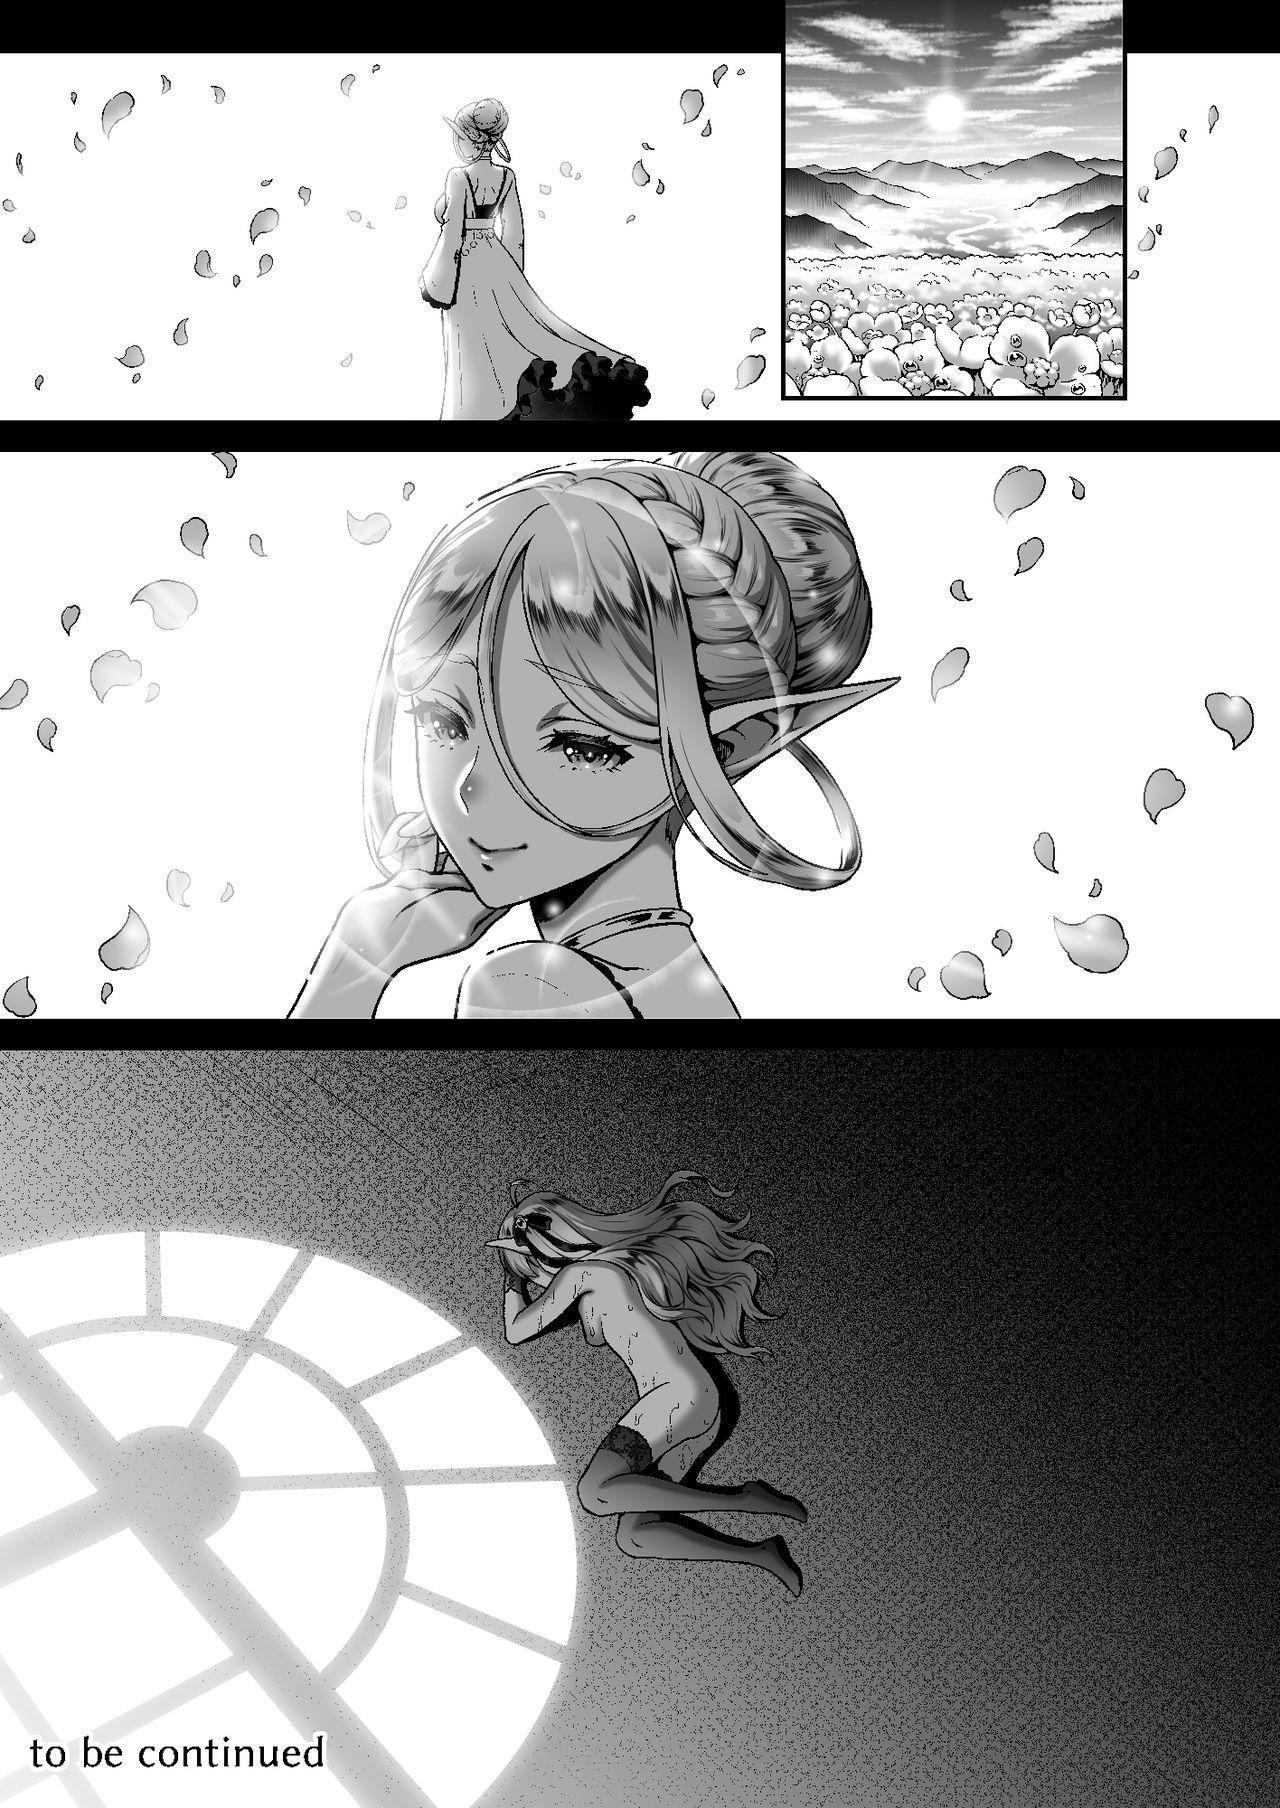 Tasogare no Shou Elf 6 - The story of Emma's side 29